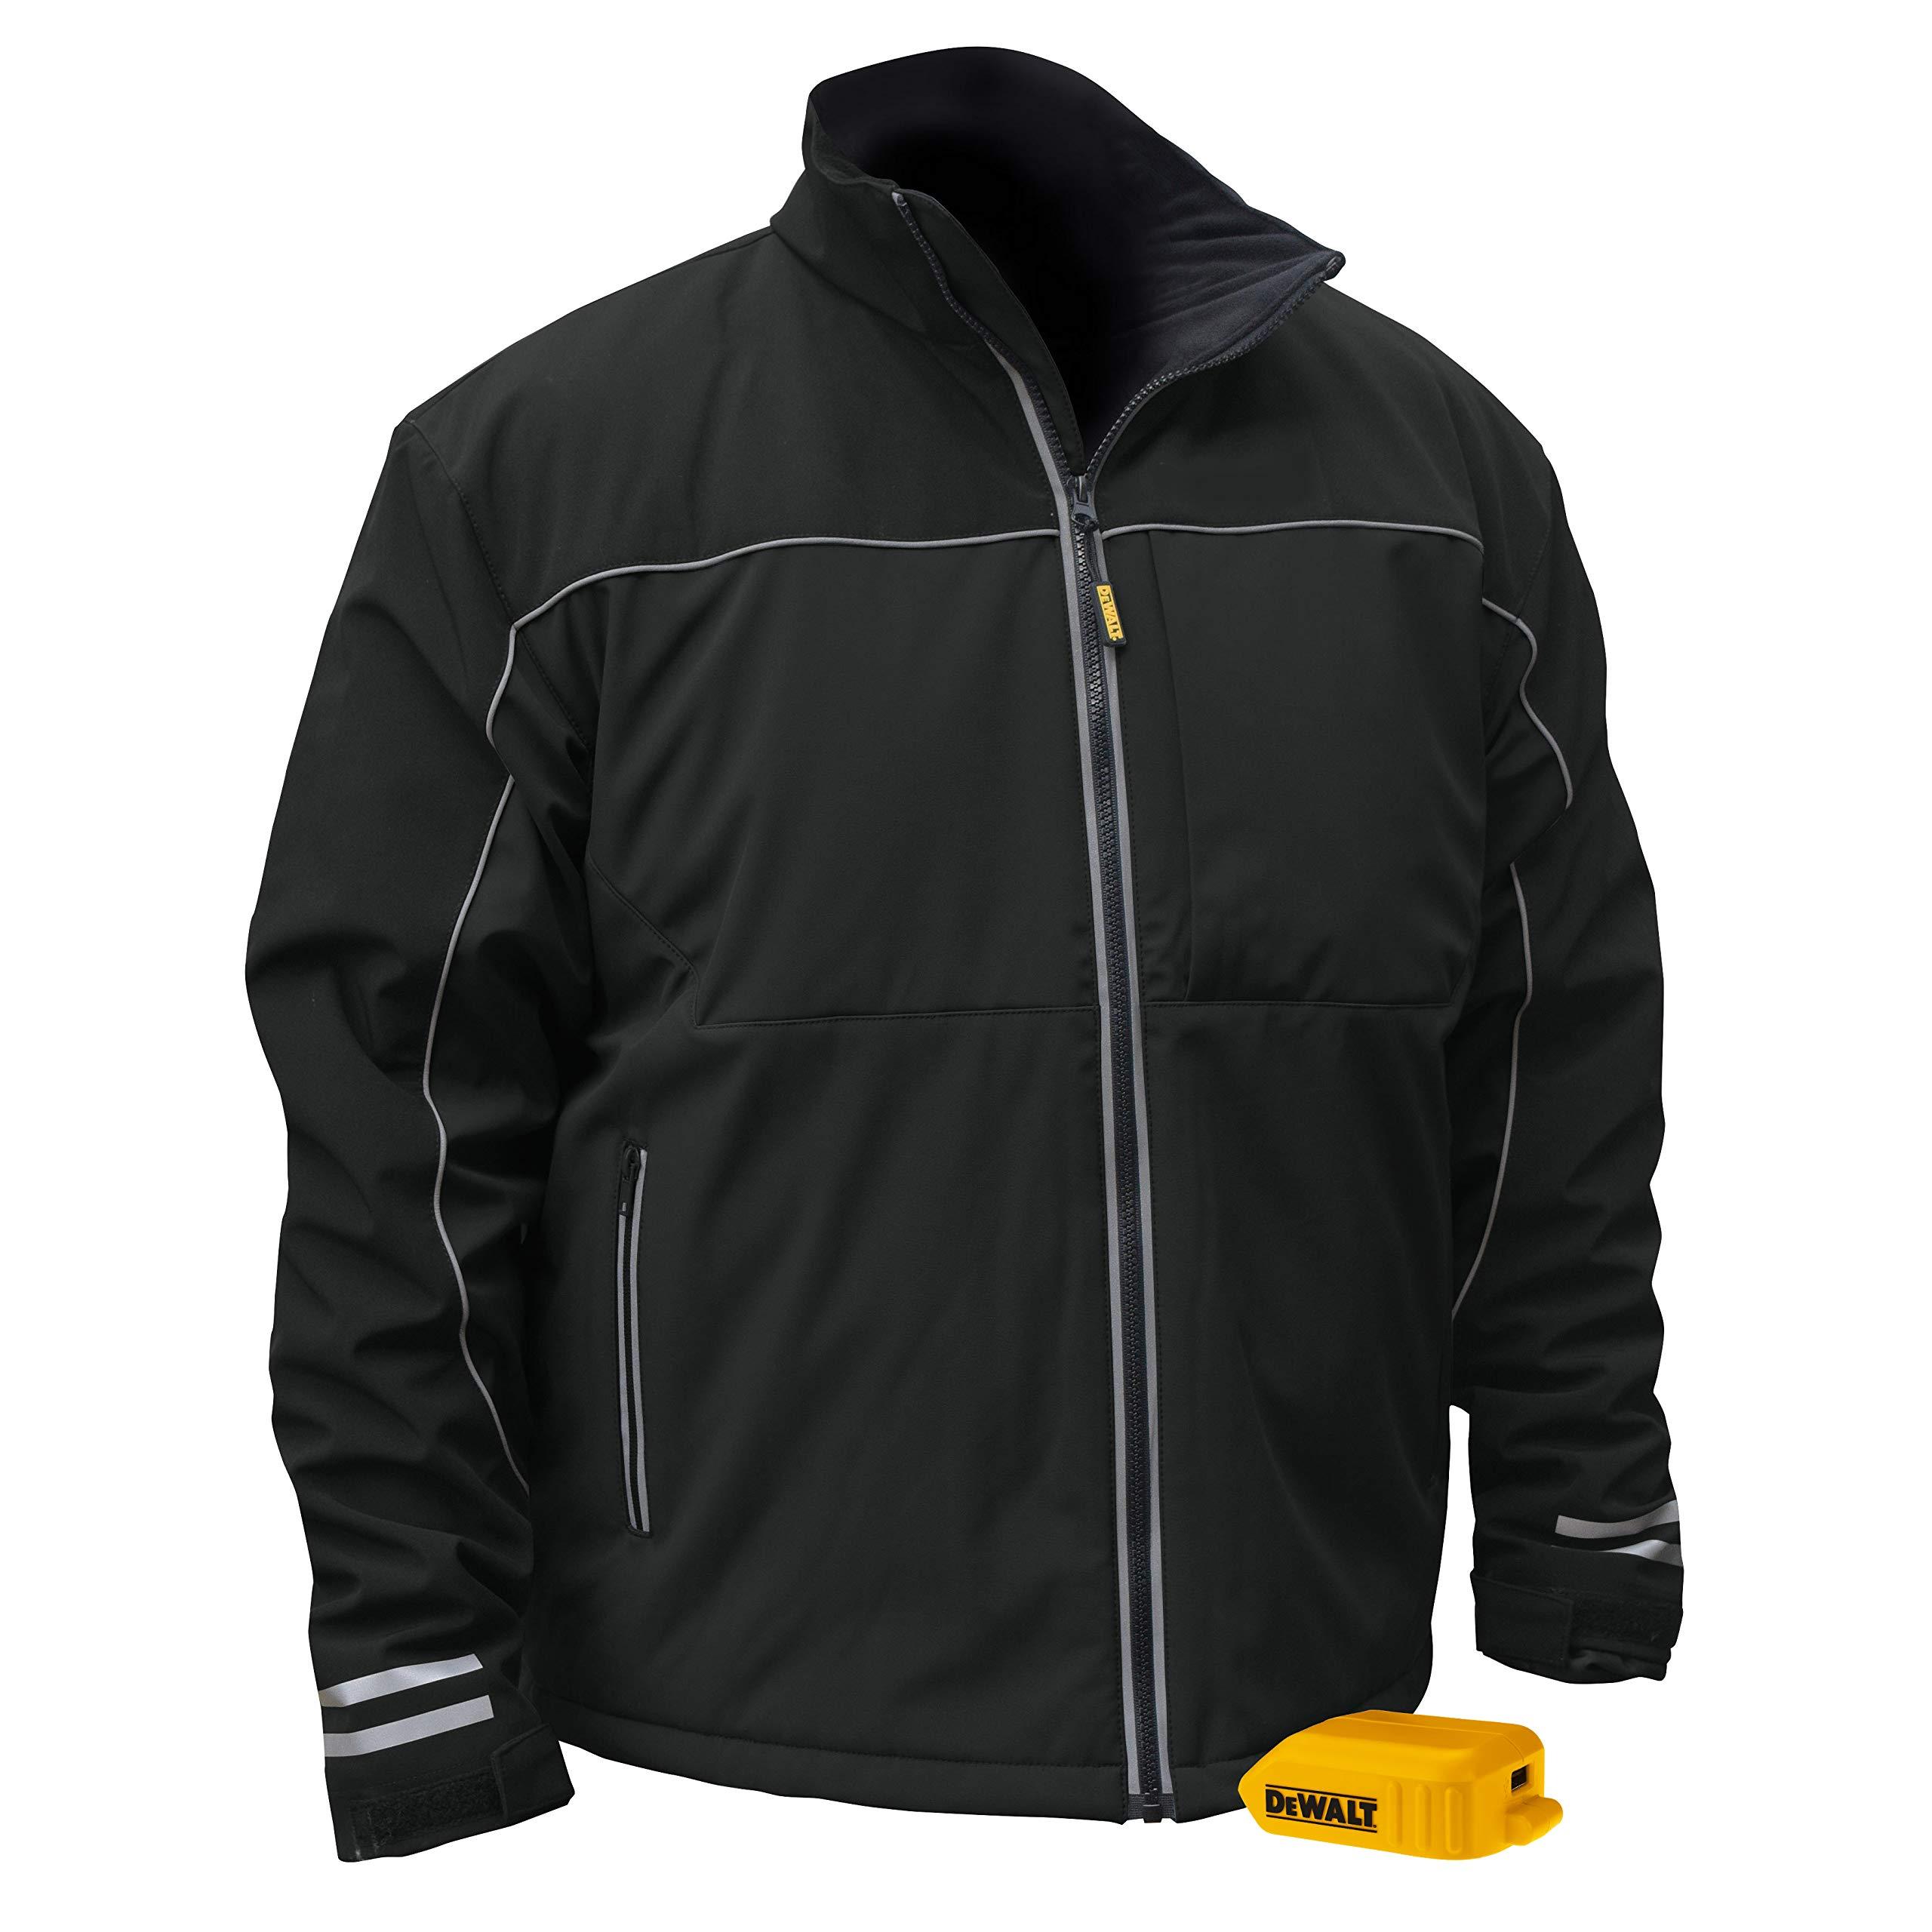 DEWALT DCHJ072B-3X Heated Lightweight Soft Shell Jacket, 3X, Black